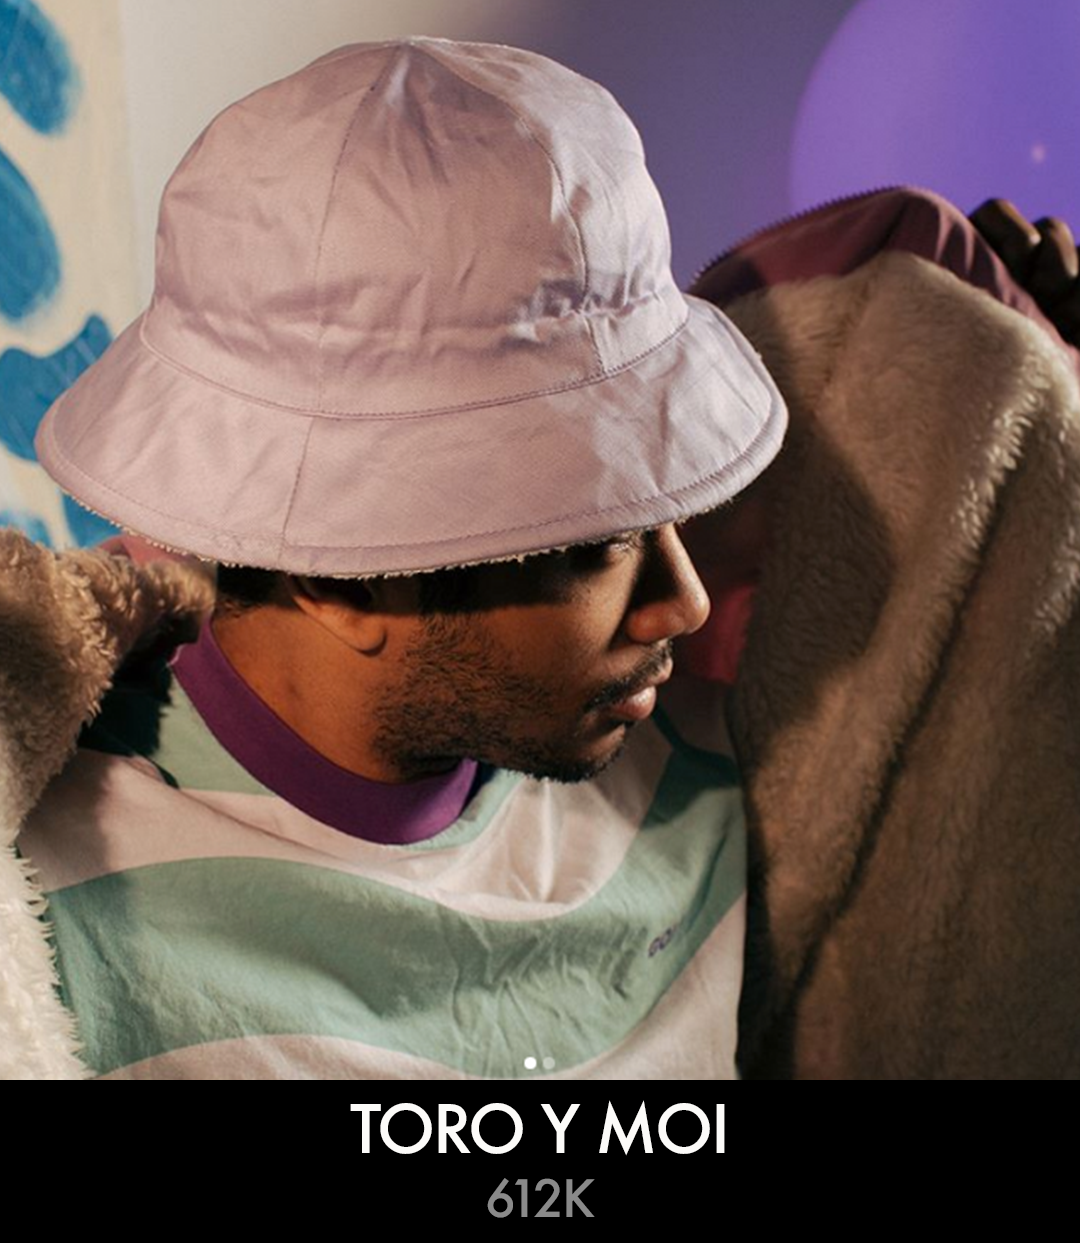 TT_W&B_Deck_Music_ToroyMoi.png